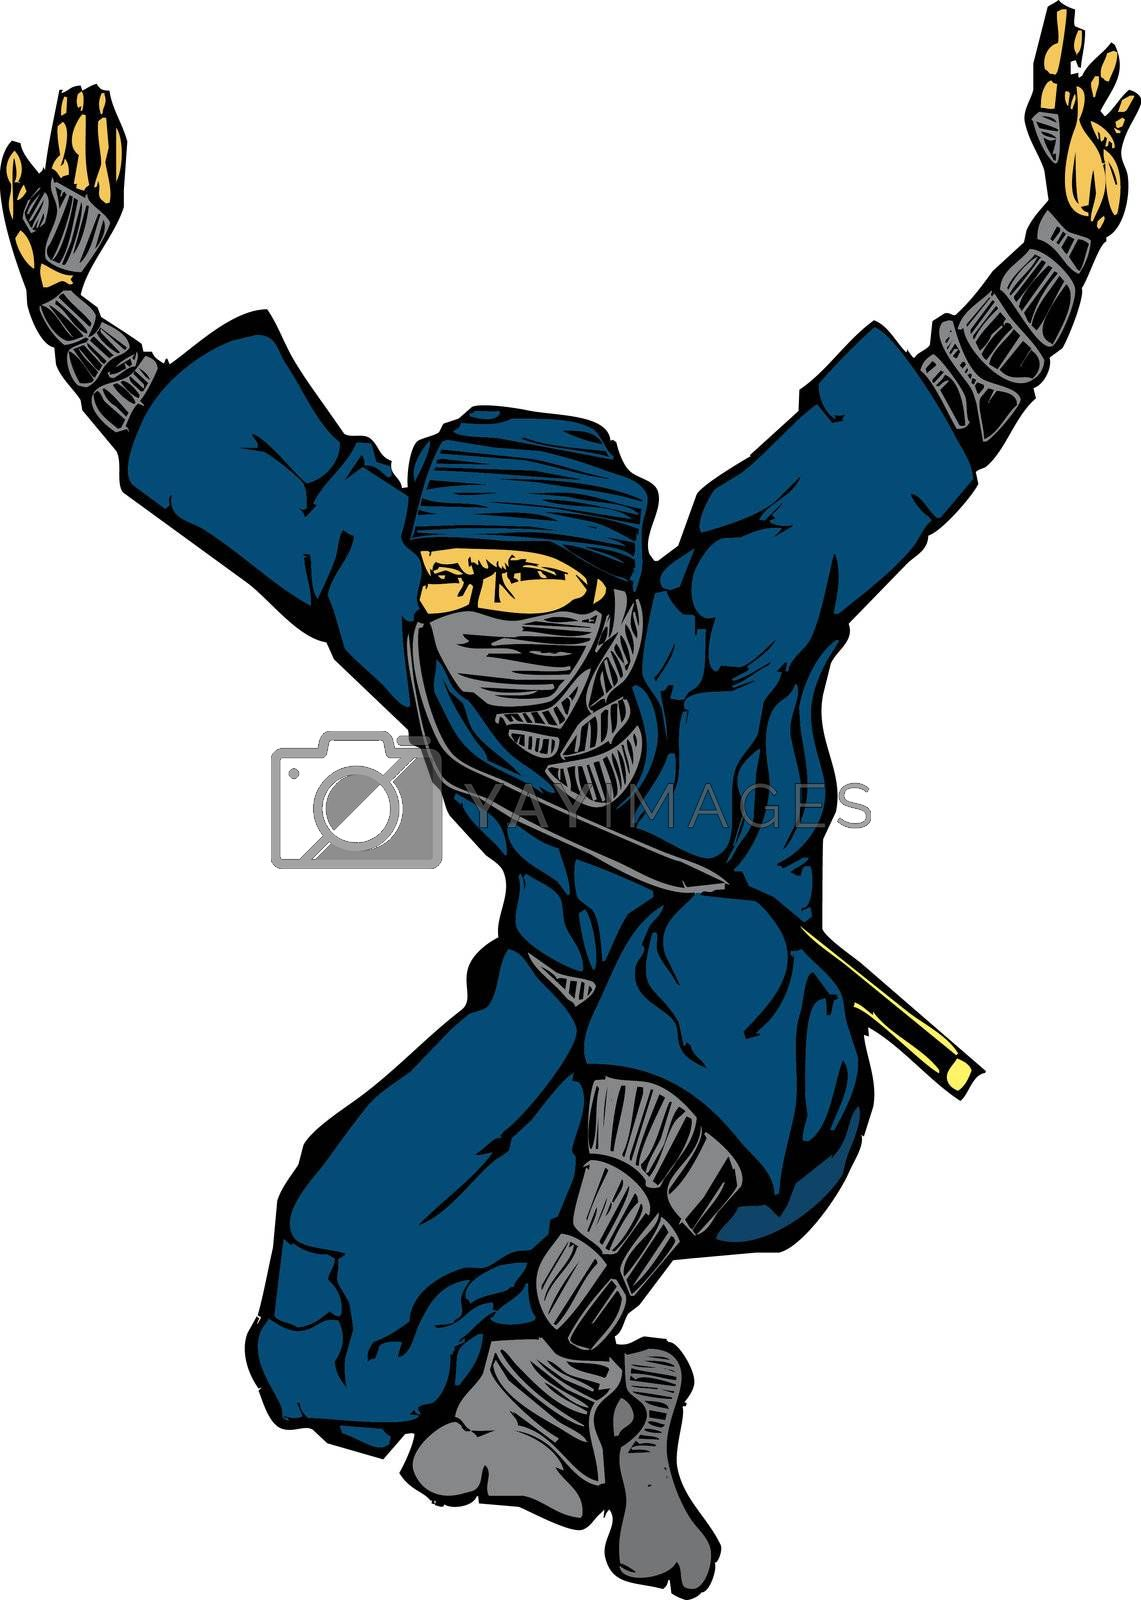 Isolated image of single leaping ninja.